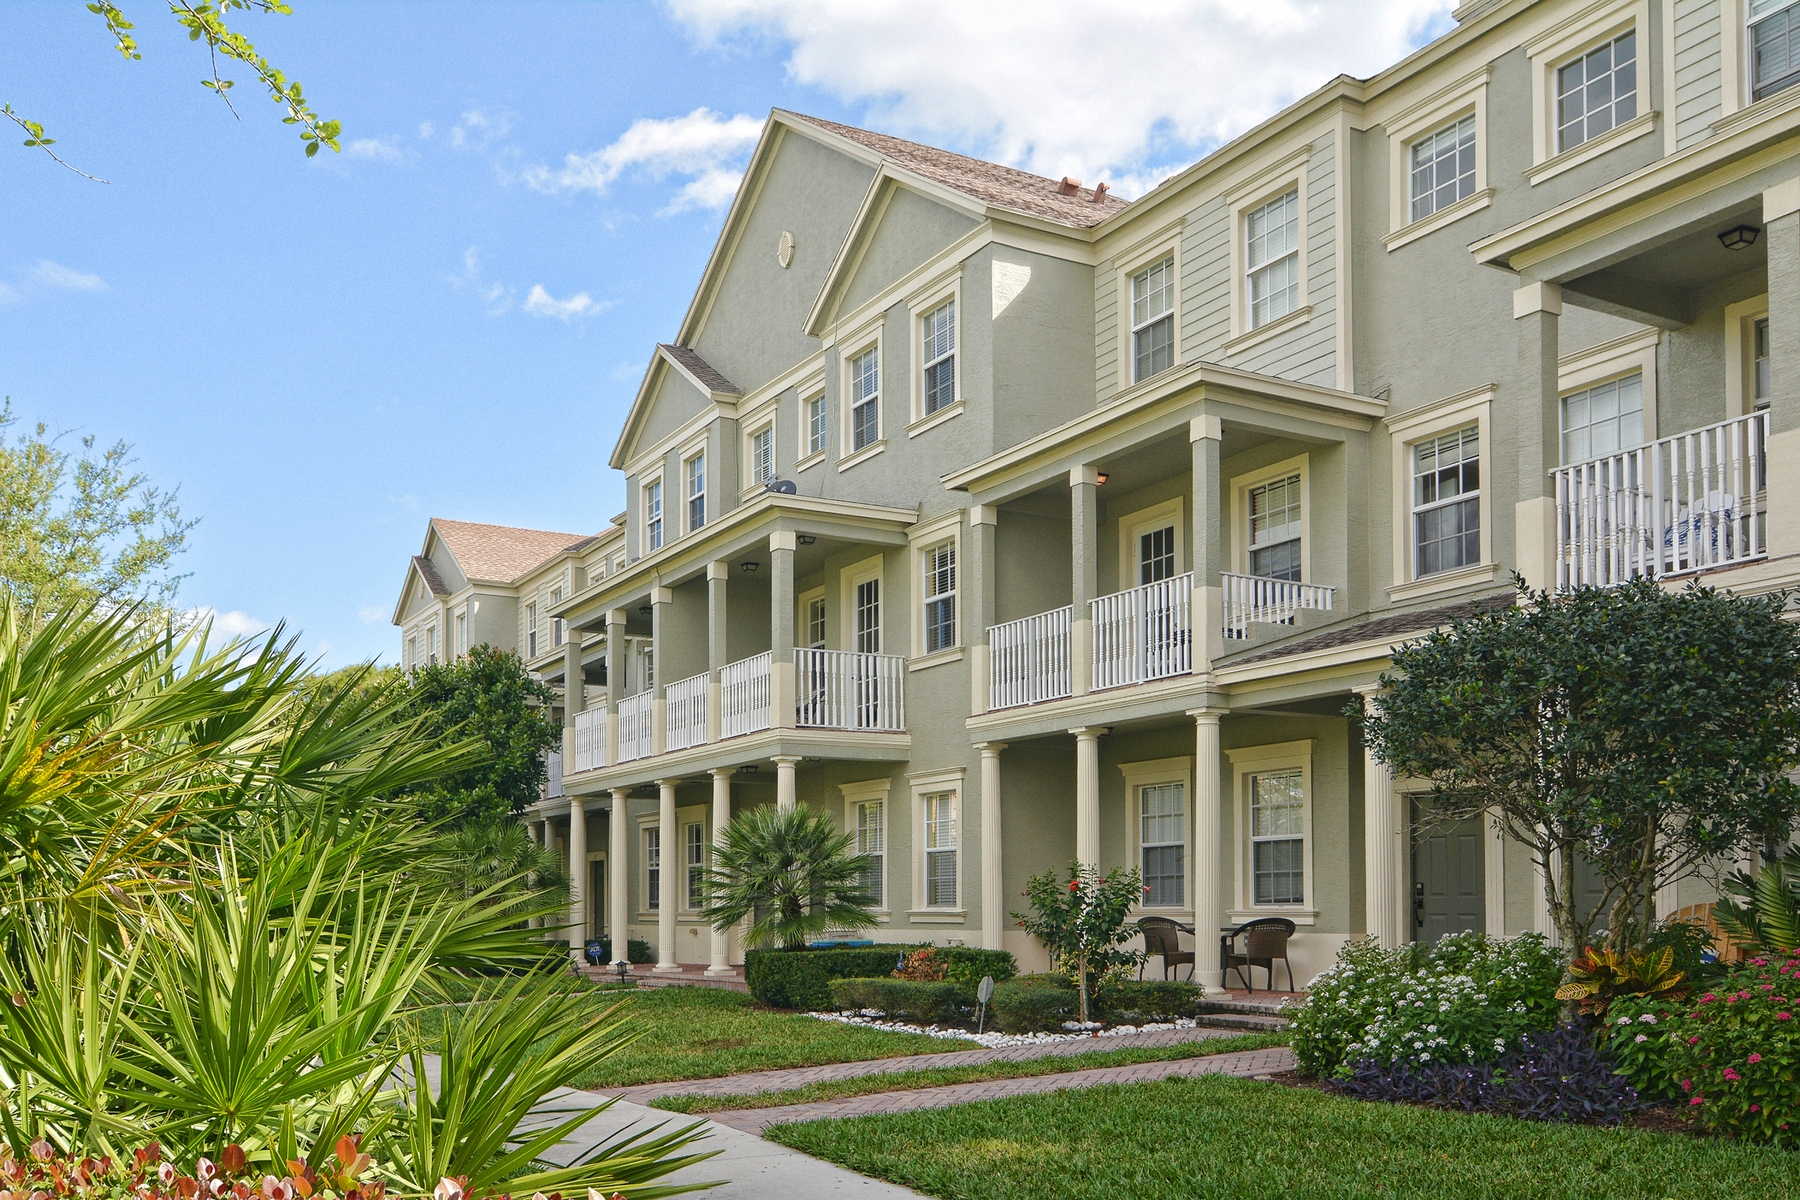 Townhouse for Sale at 121 E Bay Ceder Circle Botanica, Jupiter, Florida, 33458 United States